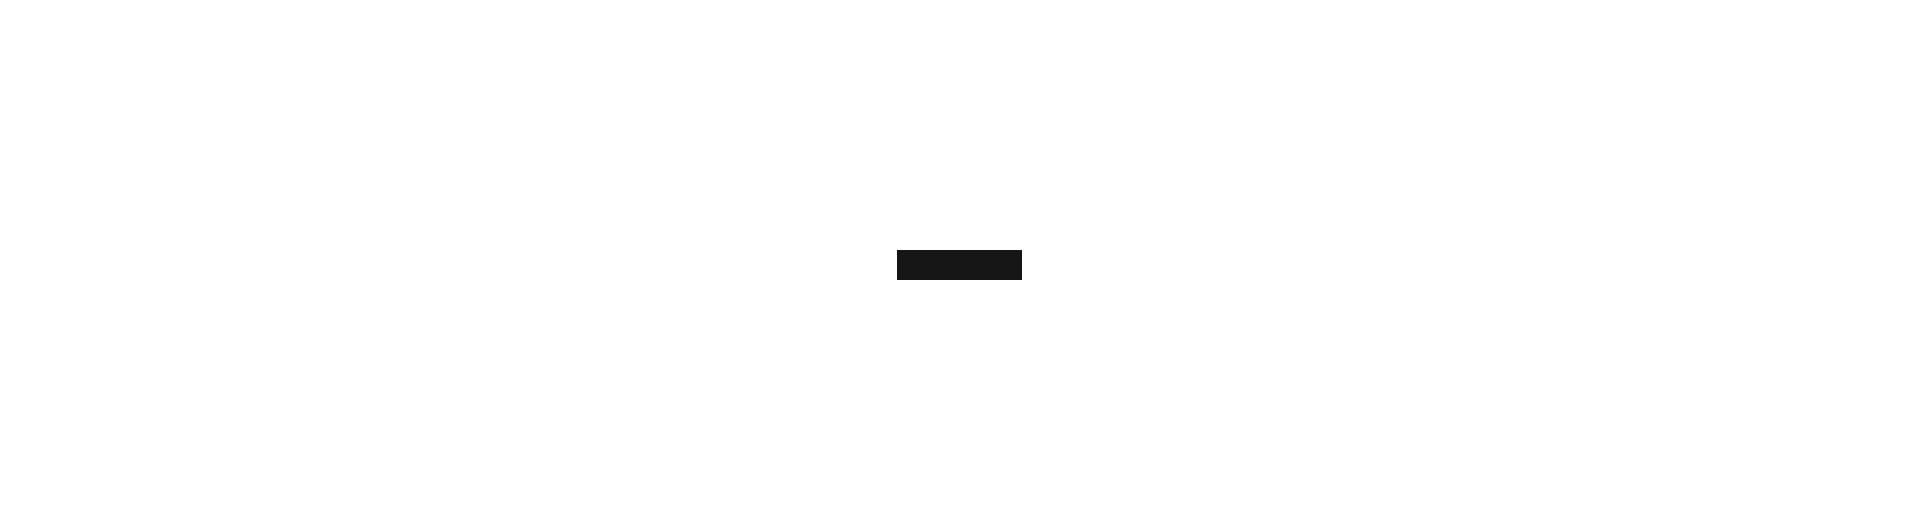 Dusel